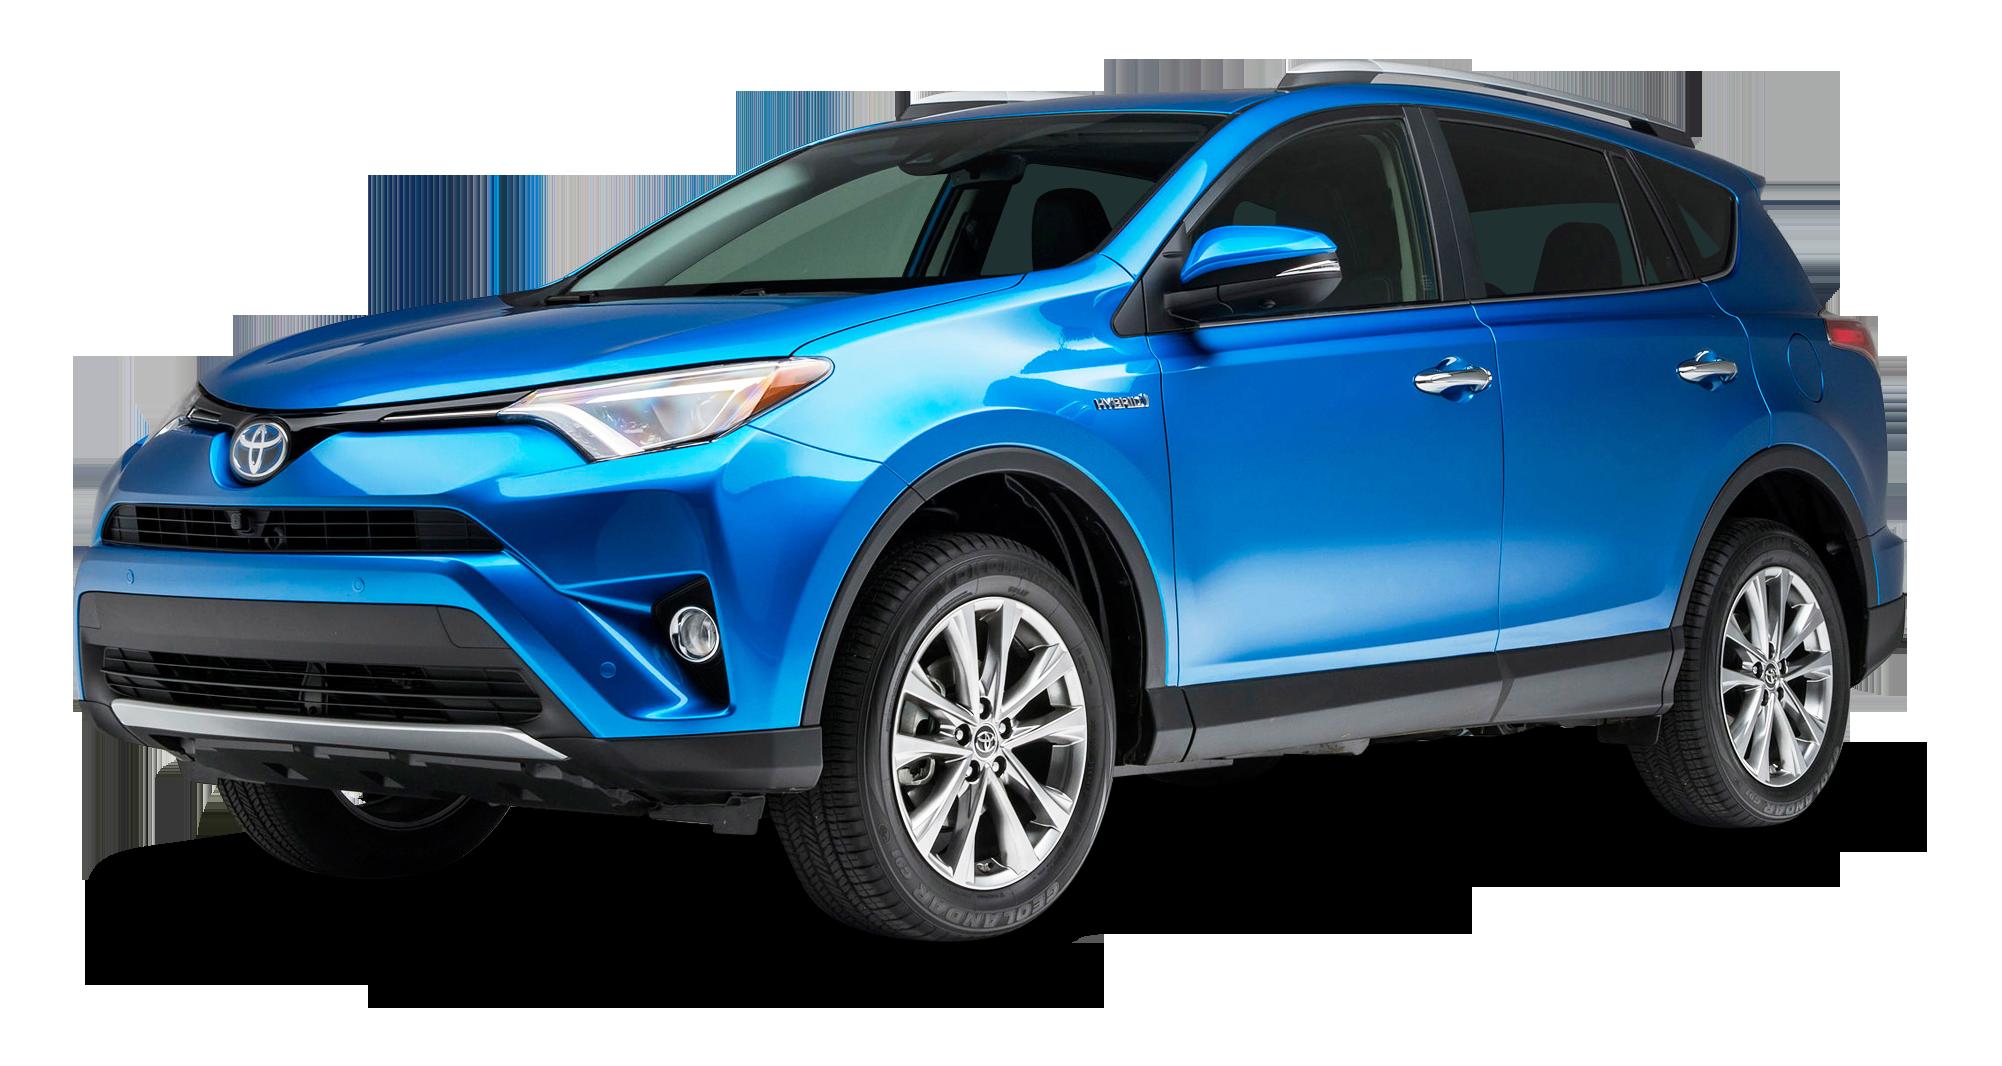 Hybrid car clipart graphic black and white download Blue Toyota RAV4 Hybrid Car PNG Image - PurePNG | Free transparent ... graphic black and white download